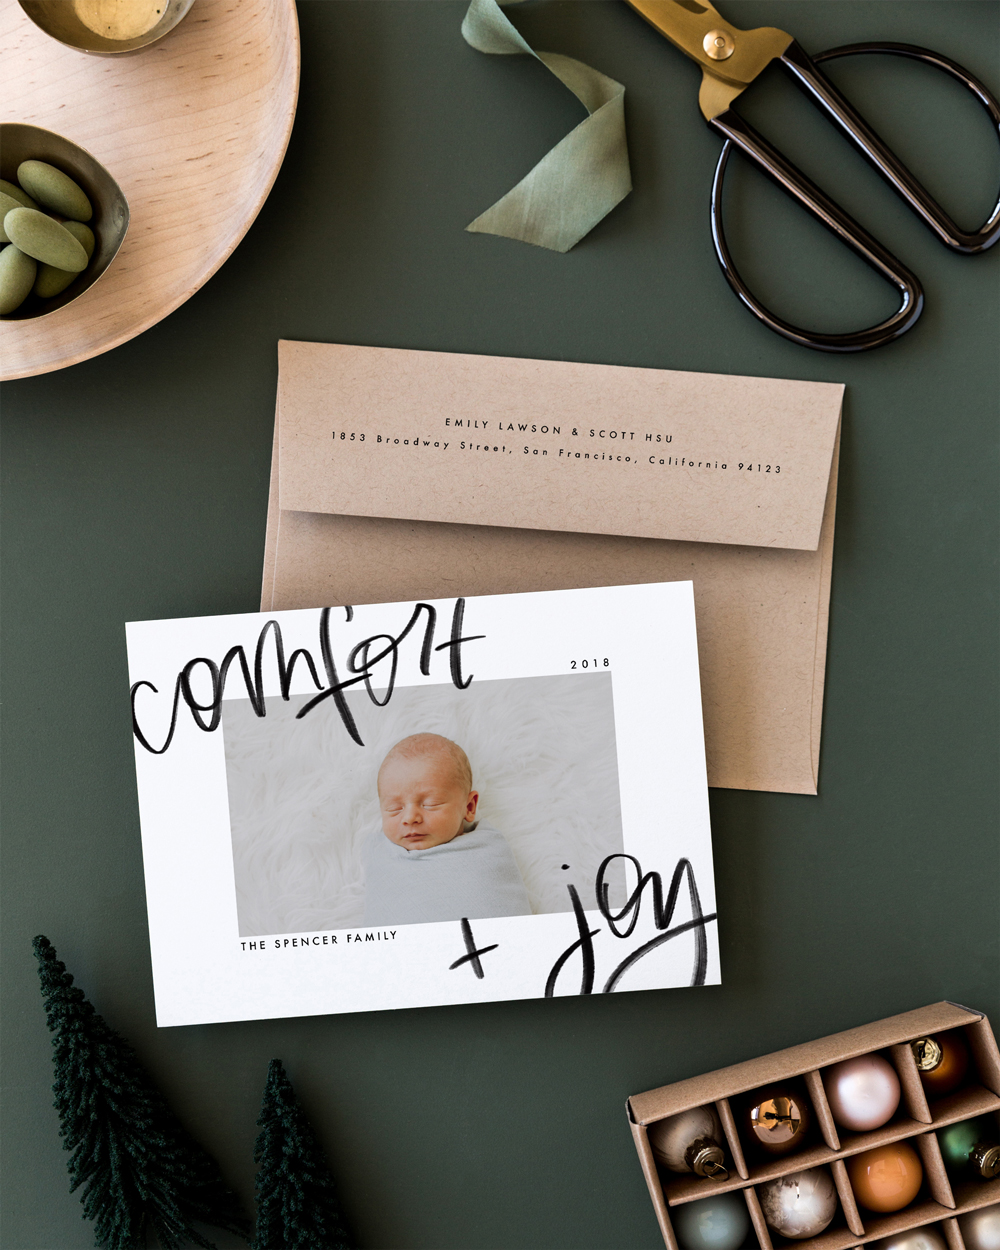 comfort-joy-card.jpg